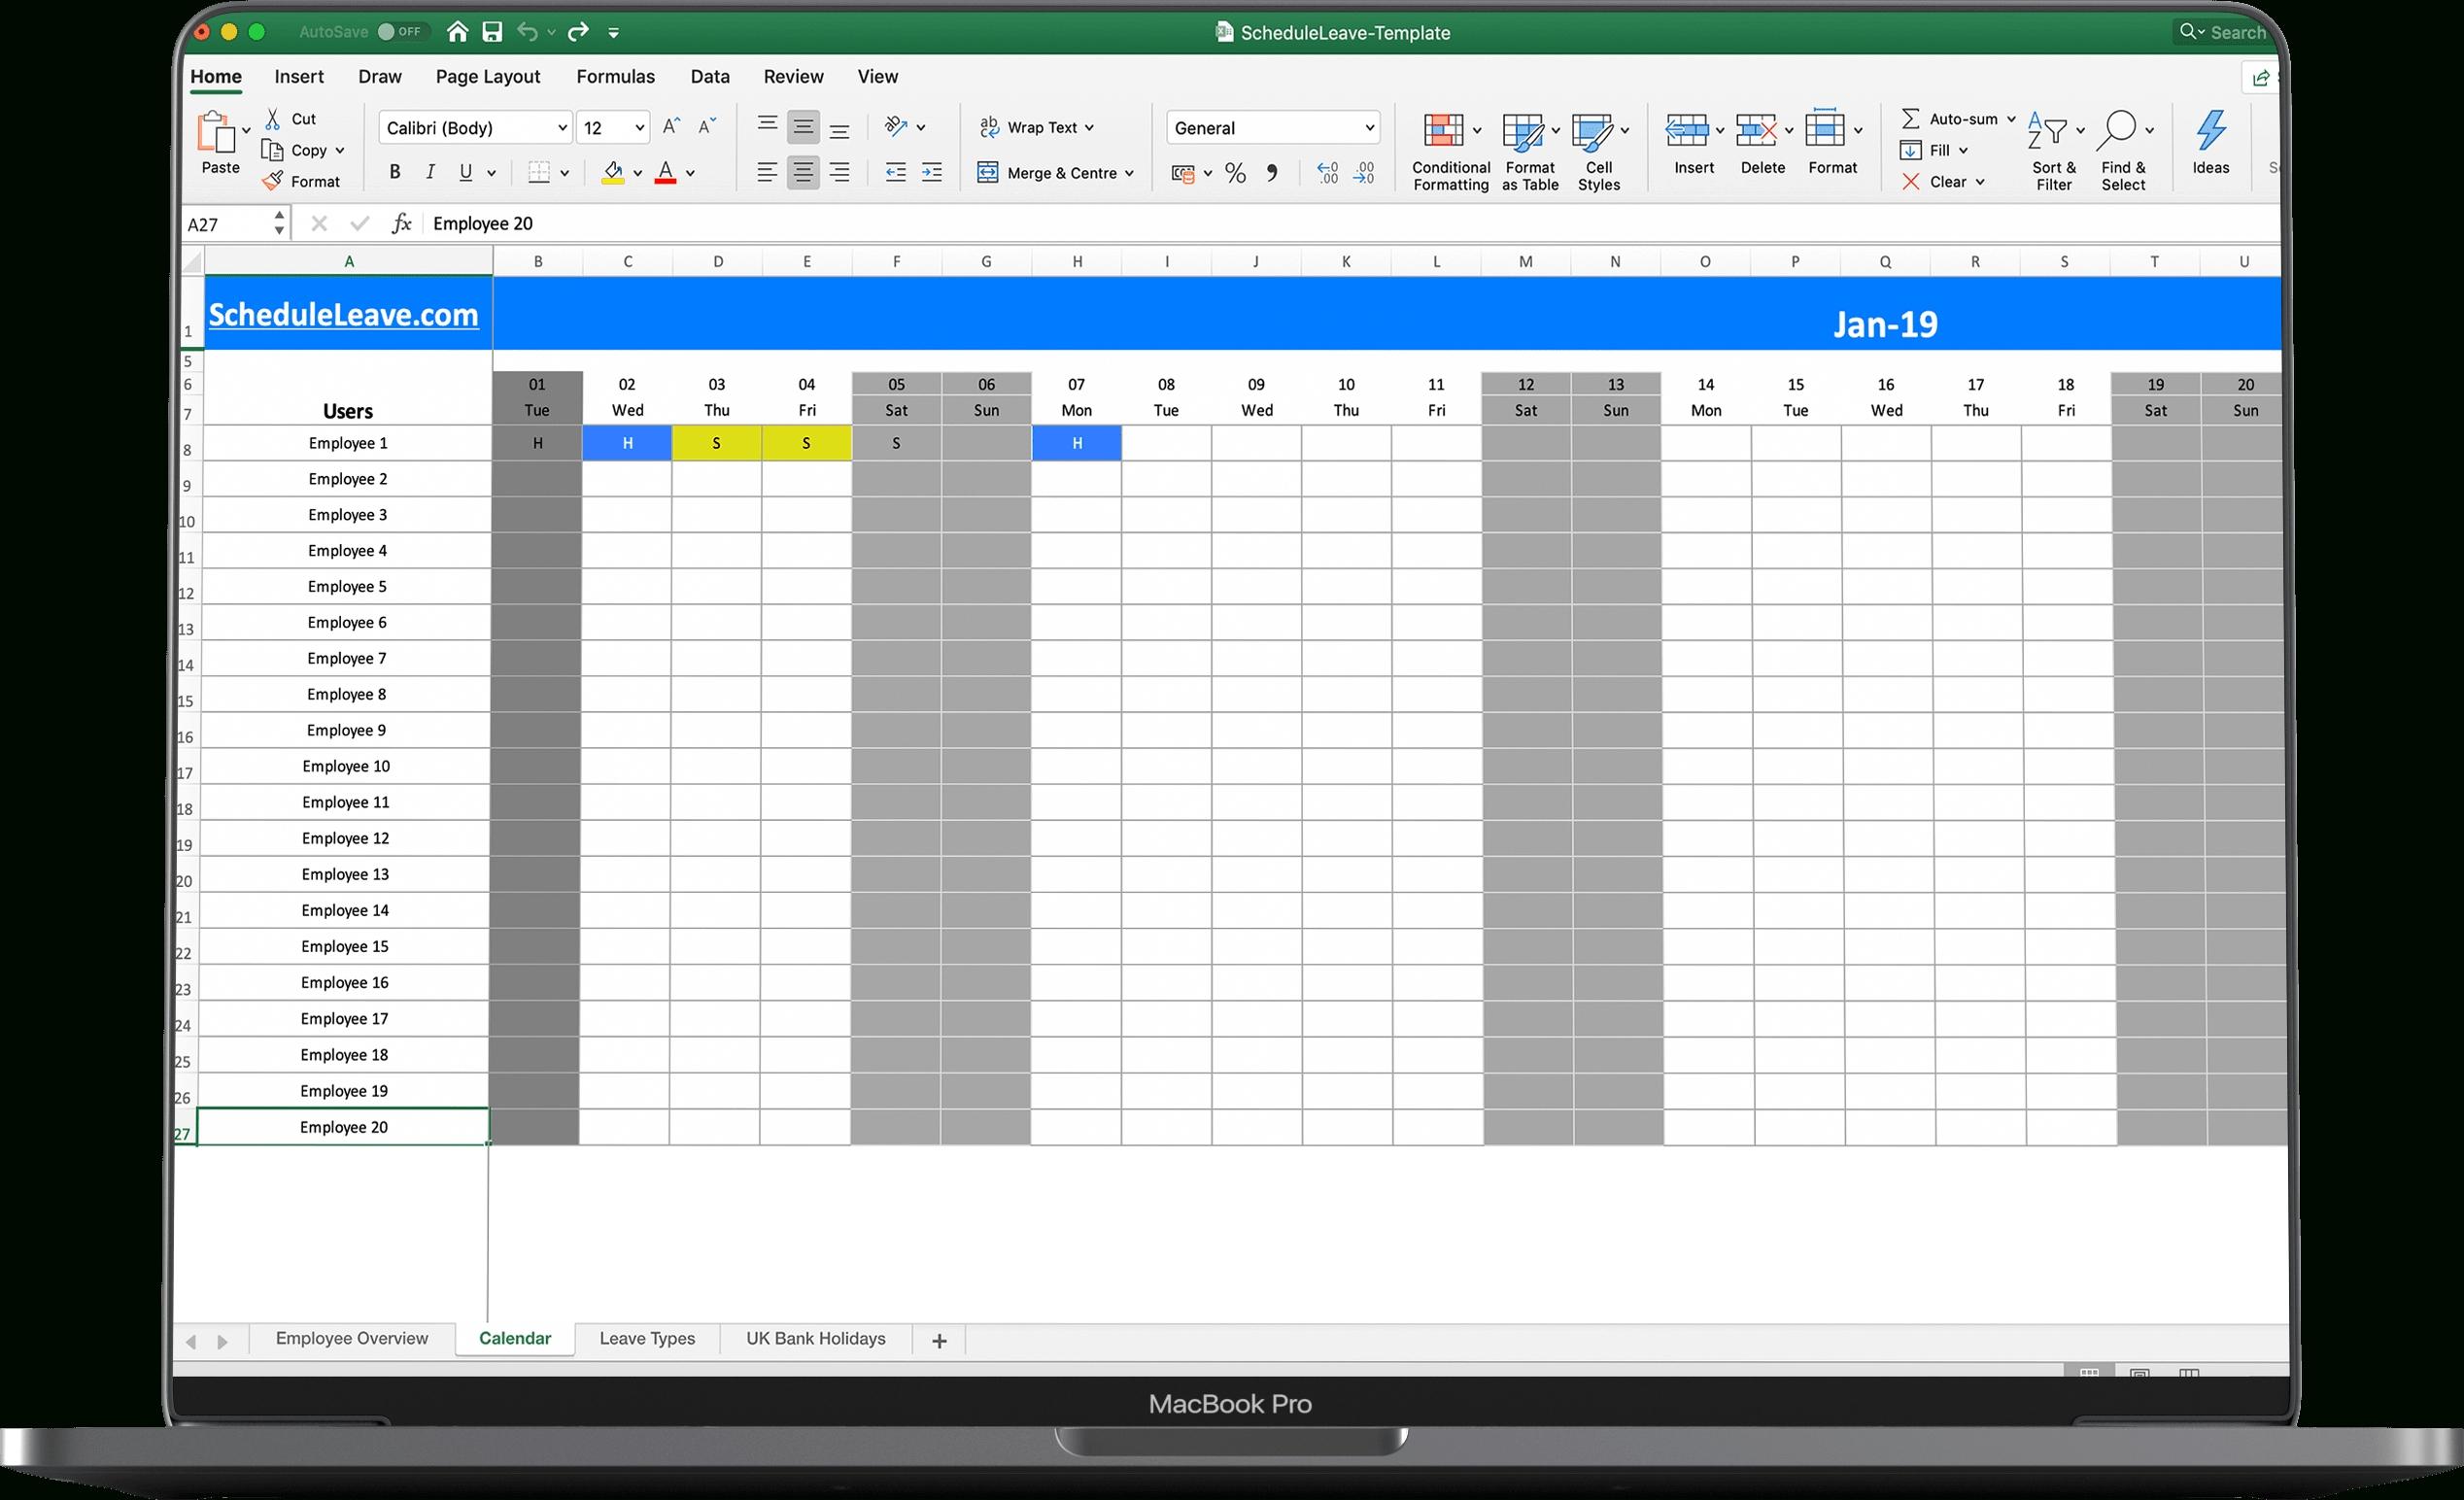 Employee Vacation Tracker Templates 2021 | Calendar